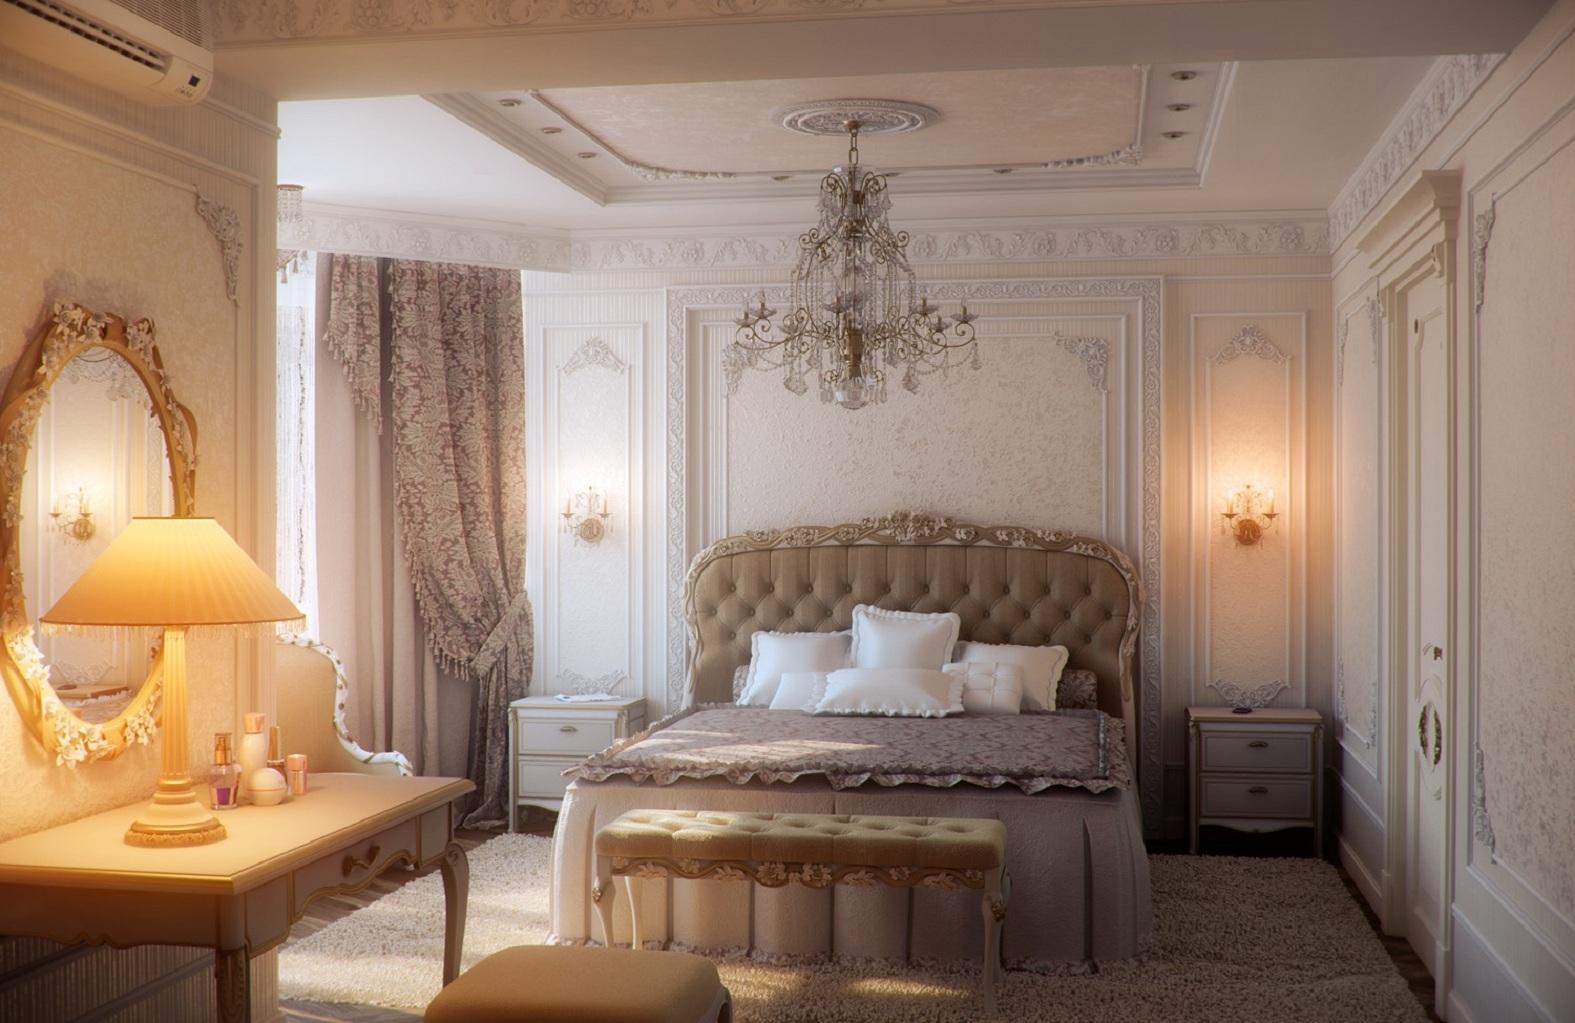 Интерьер фото спальни шикарной